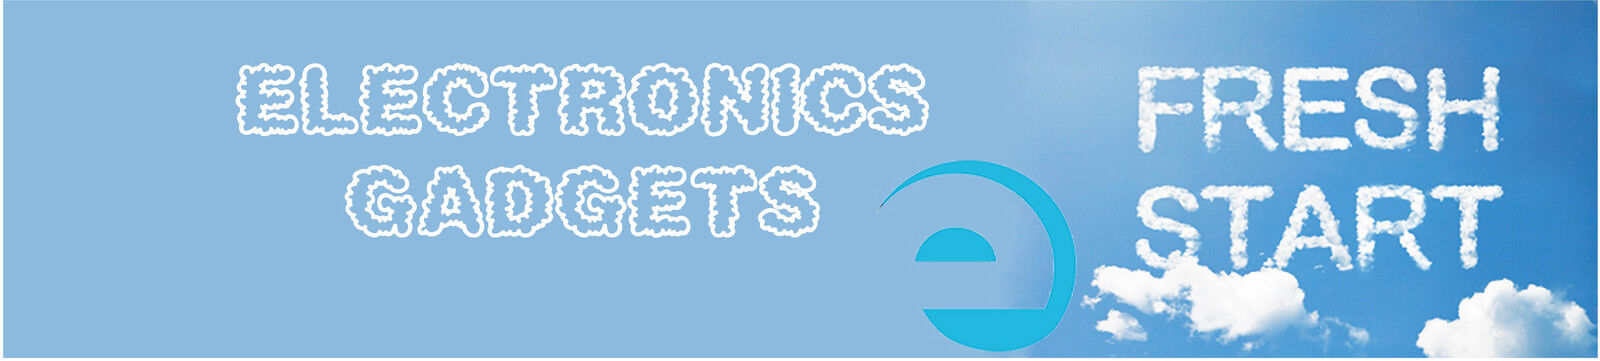 Eratech Elektronics - Gadgets